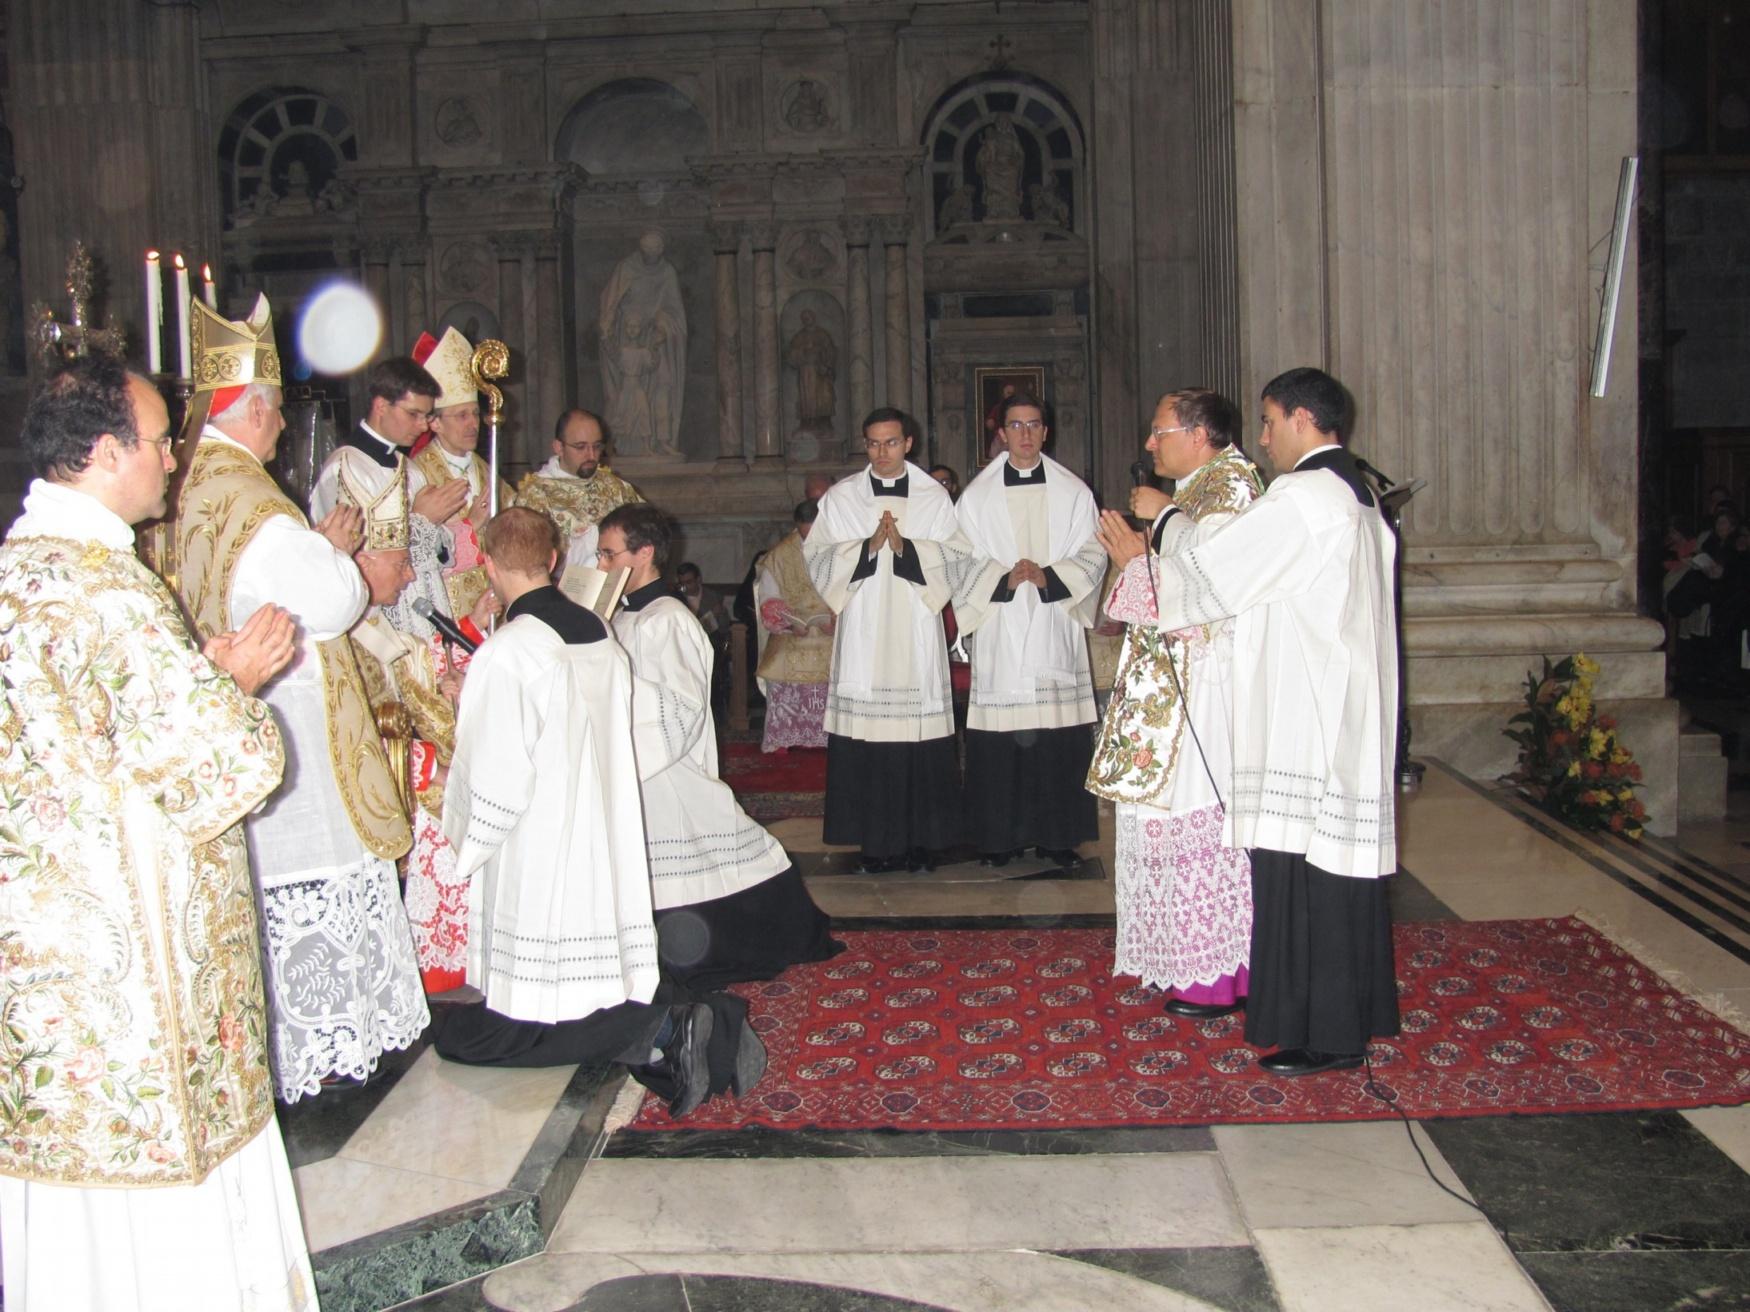 ordinazione_episcopale_gallese_2012-11-11-16-24-32